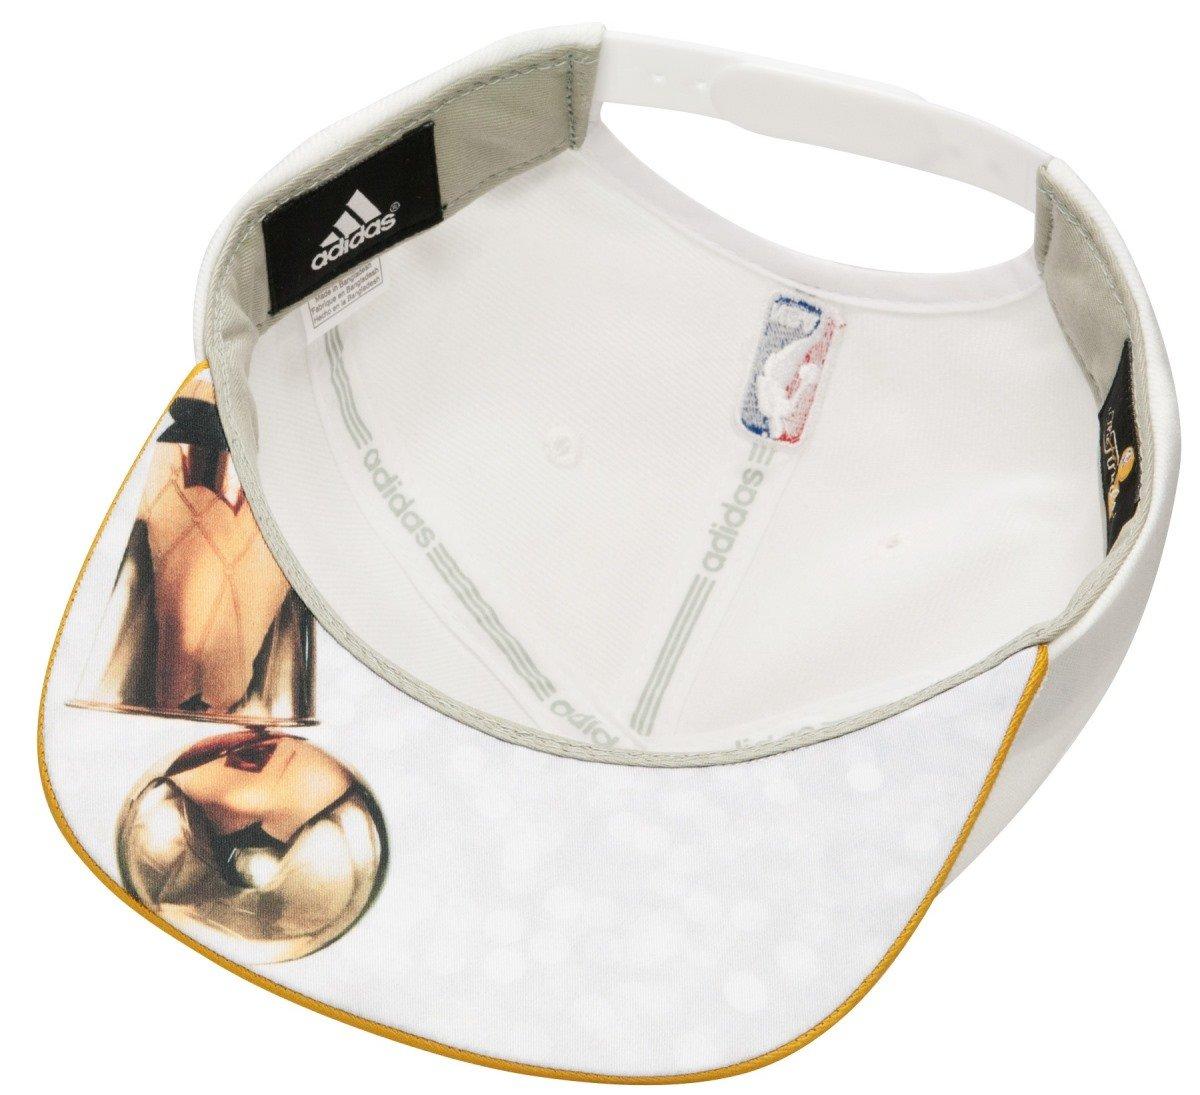 3ad31087936 adidas San Antonio Spurs 2014 NBA Finals Champions Locker Room Snapback Hat  - White  Amazon.co.uk  Sports   Outdoors